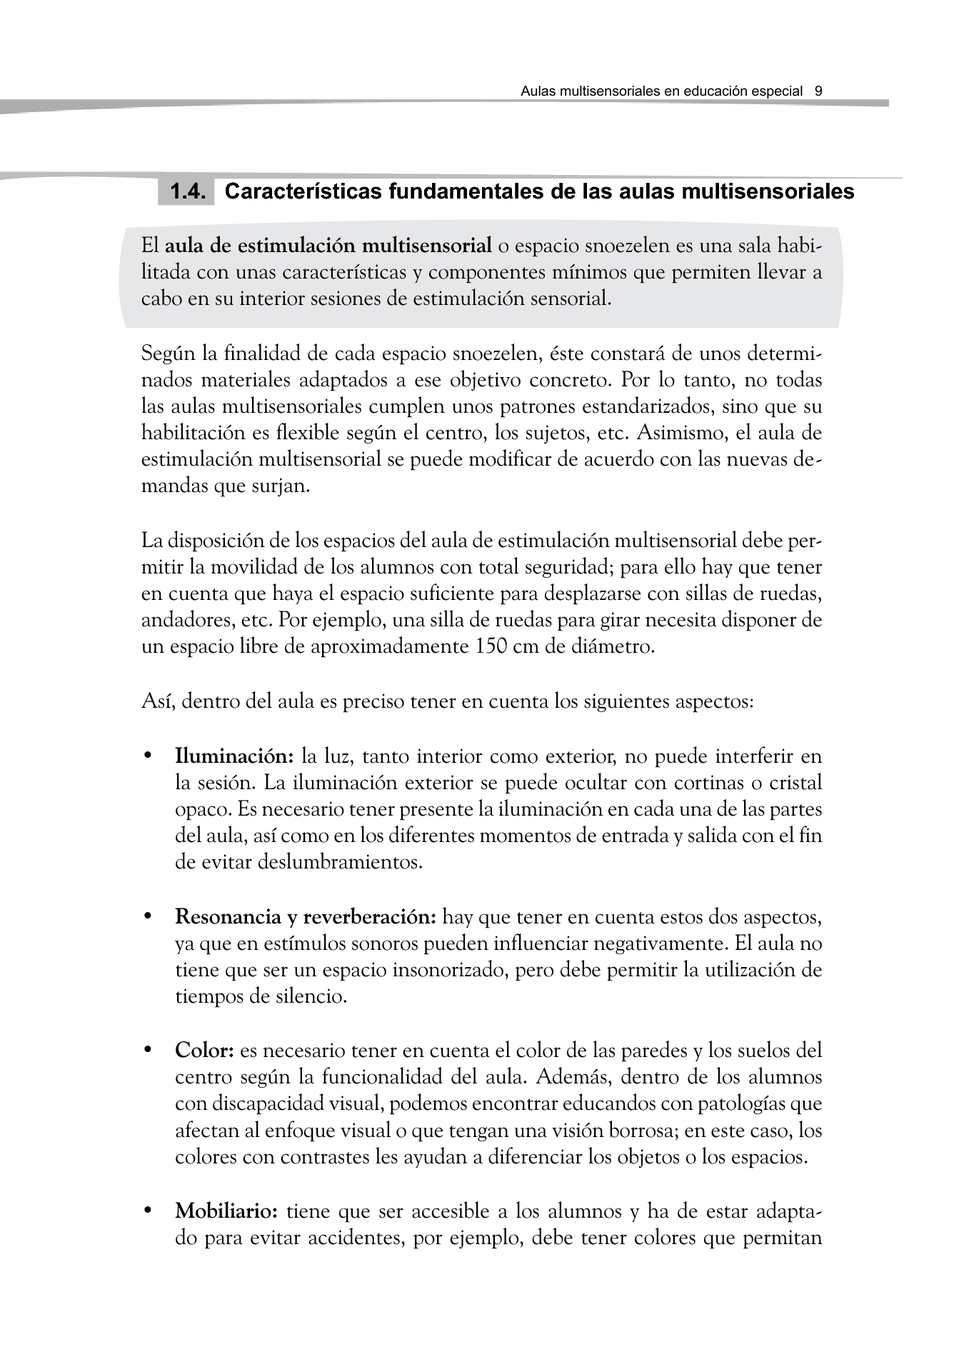 aulas multisensoriales - CALAMEO Downloader